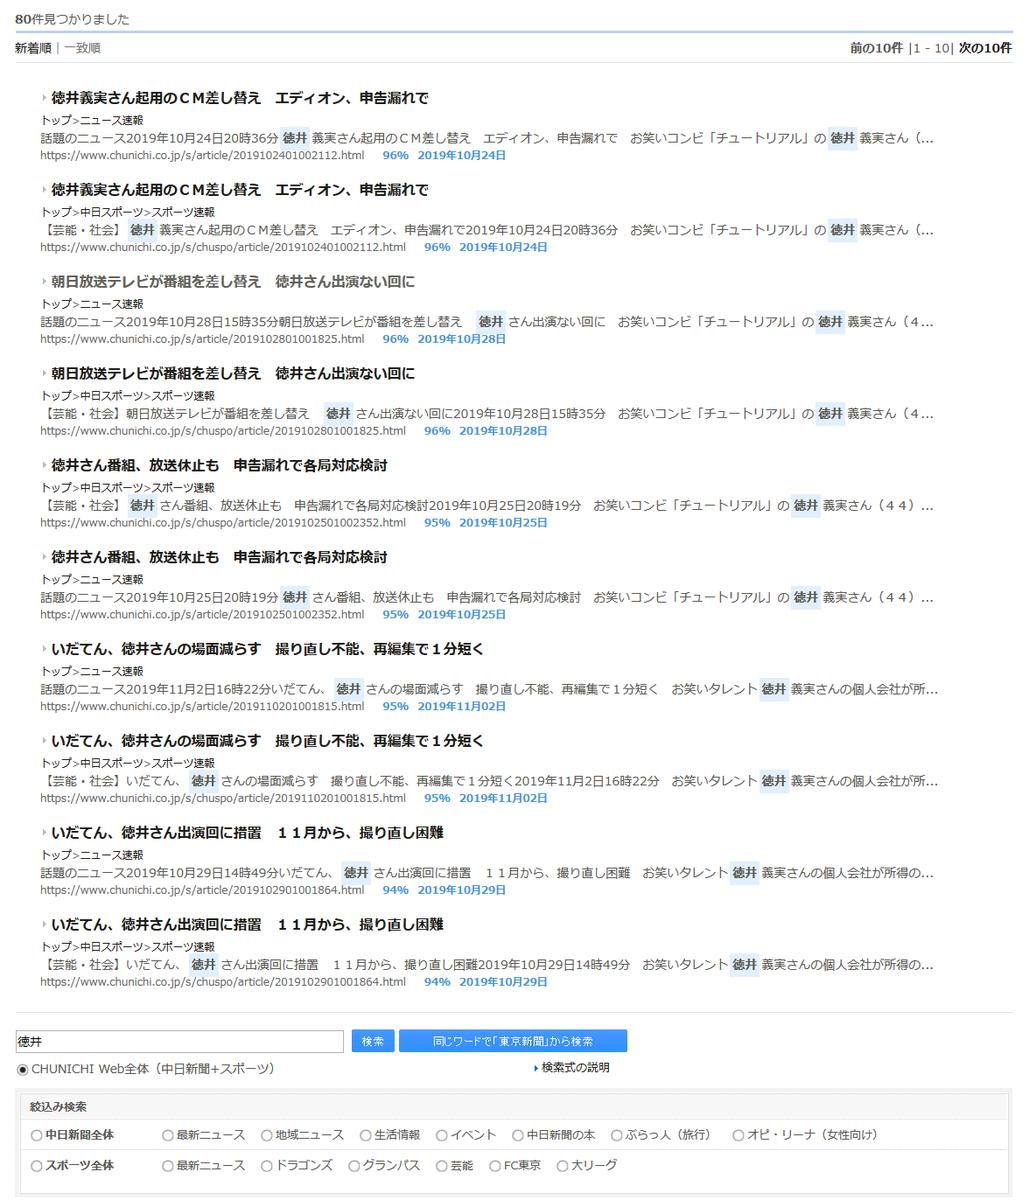 中日新聞 (CHUNICHI Web)Screenshot_2020-01-07